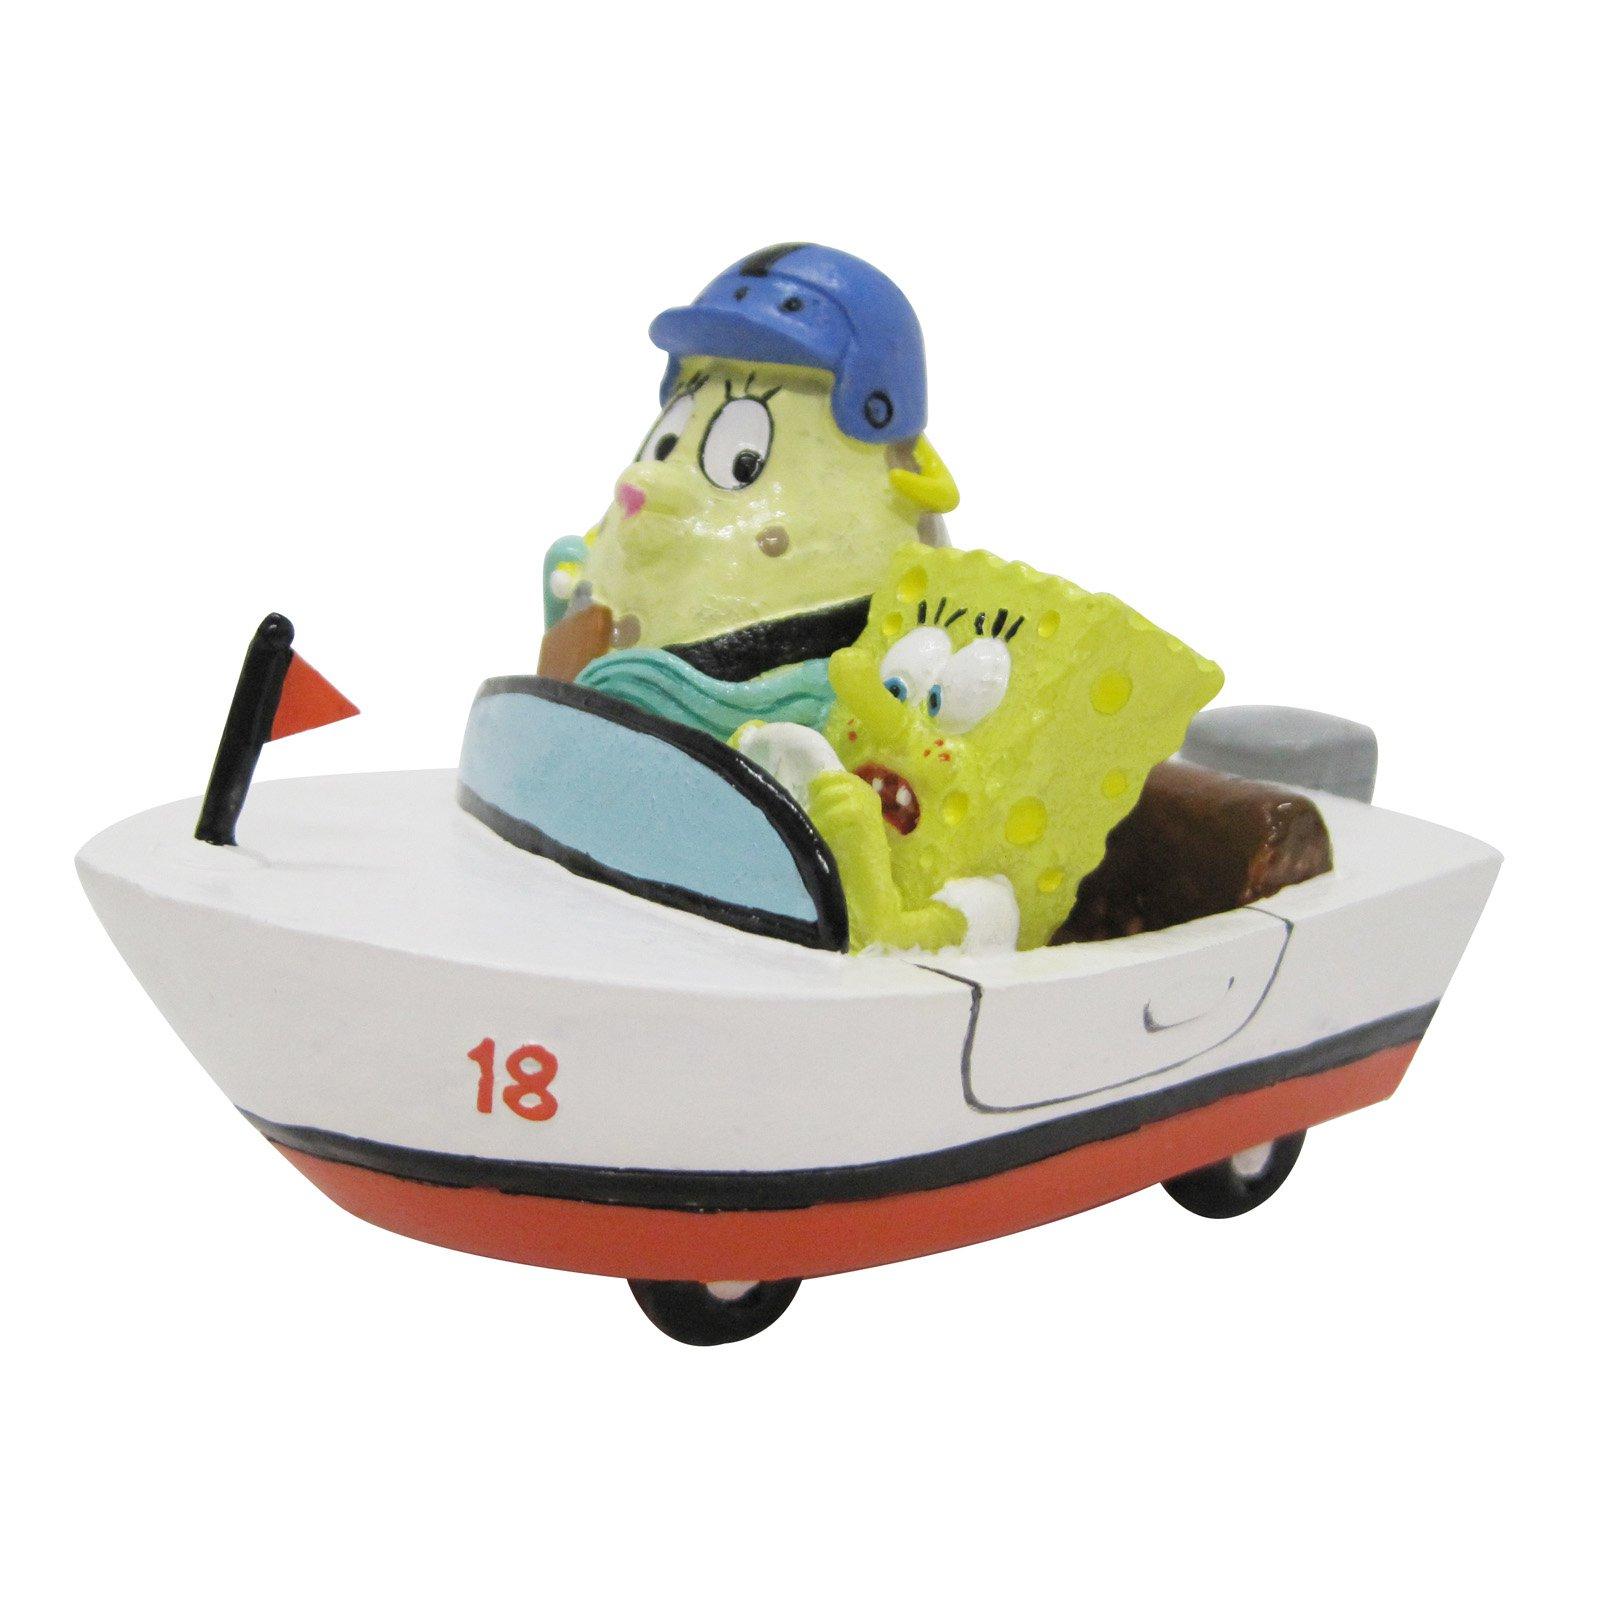 Penn Plax SpongeBob and Mrs. Puff in Rowboat Aquarium Figure